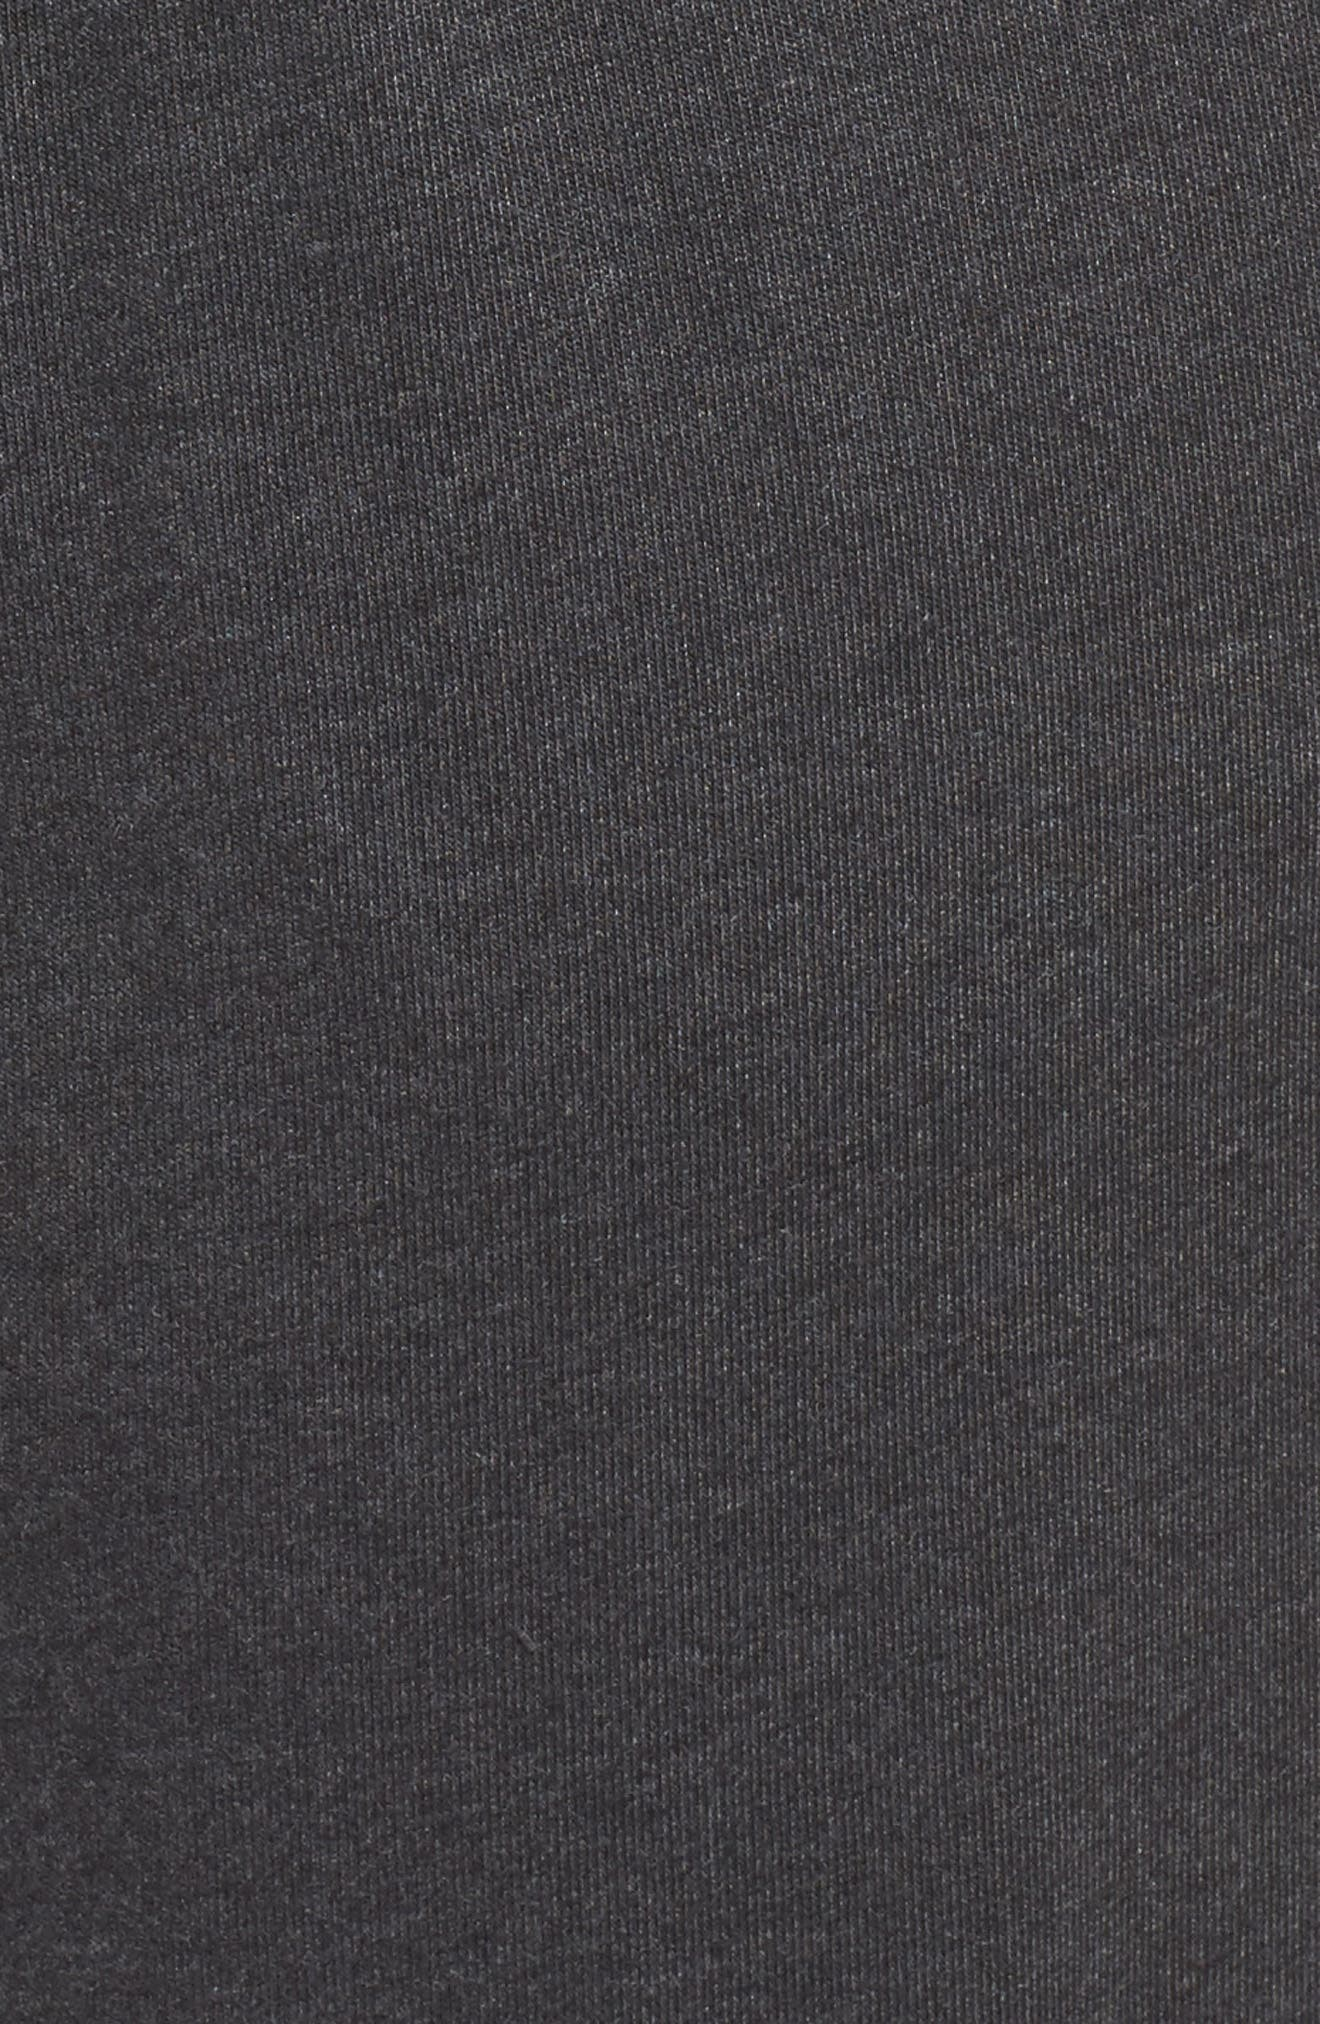 NIKE,                             Sportswear Gym Capris,                             Alternate thumbnail 5, color,                             001